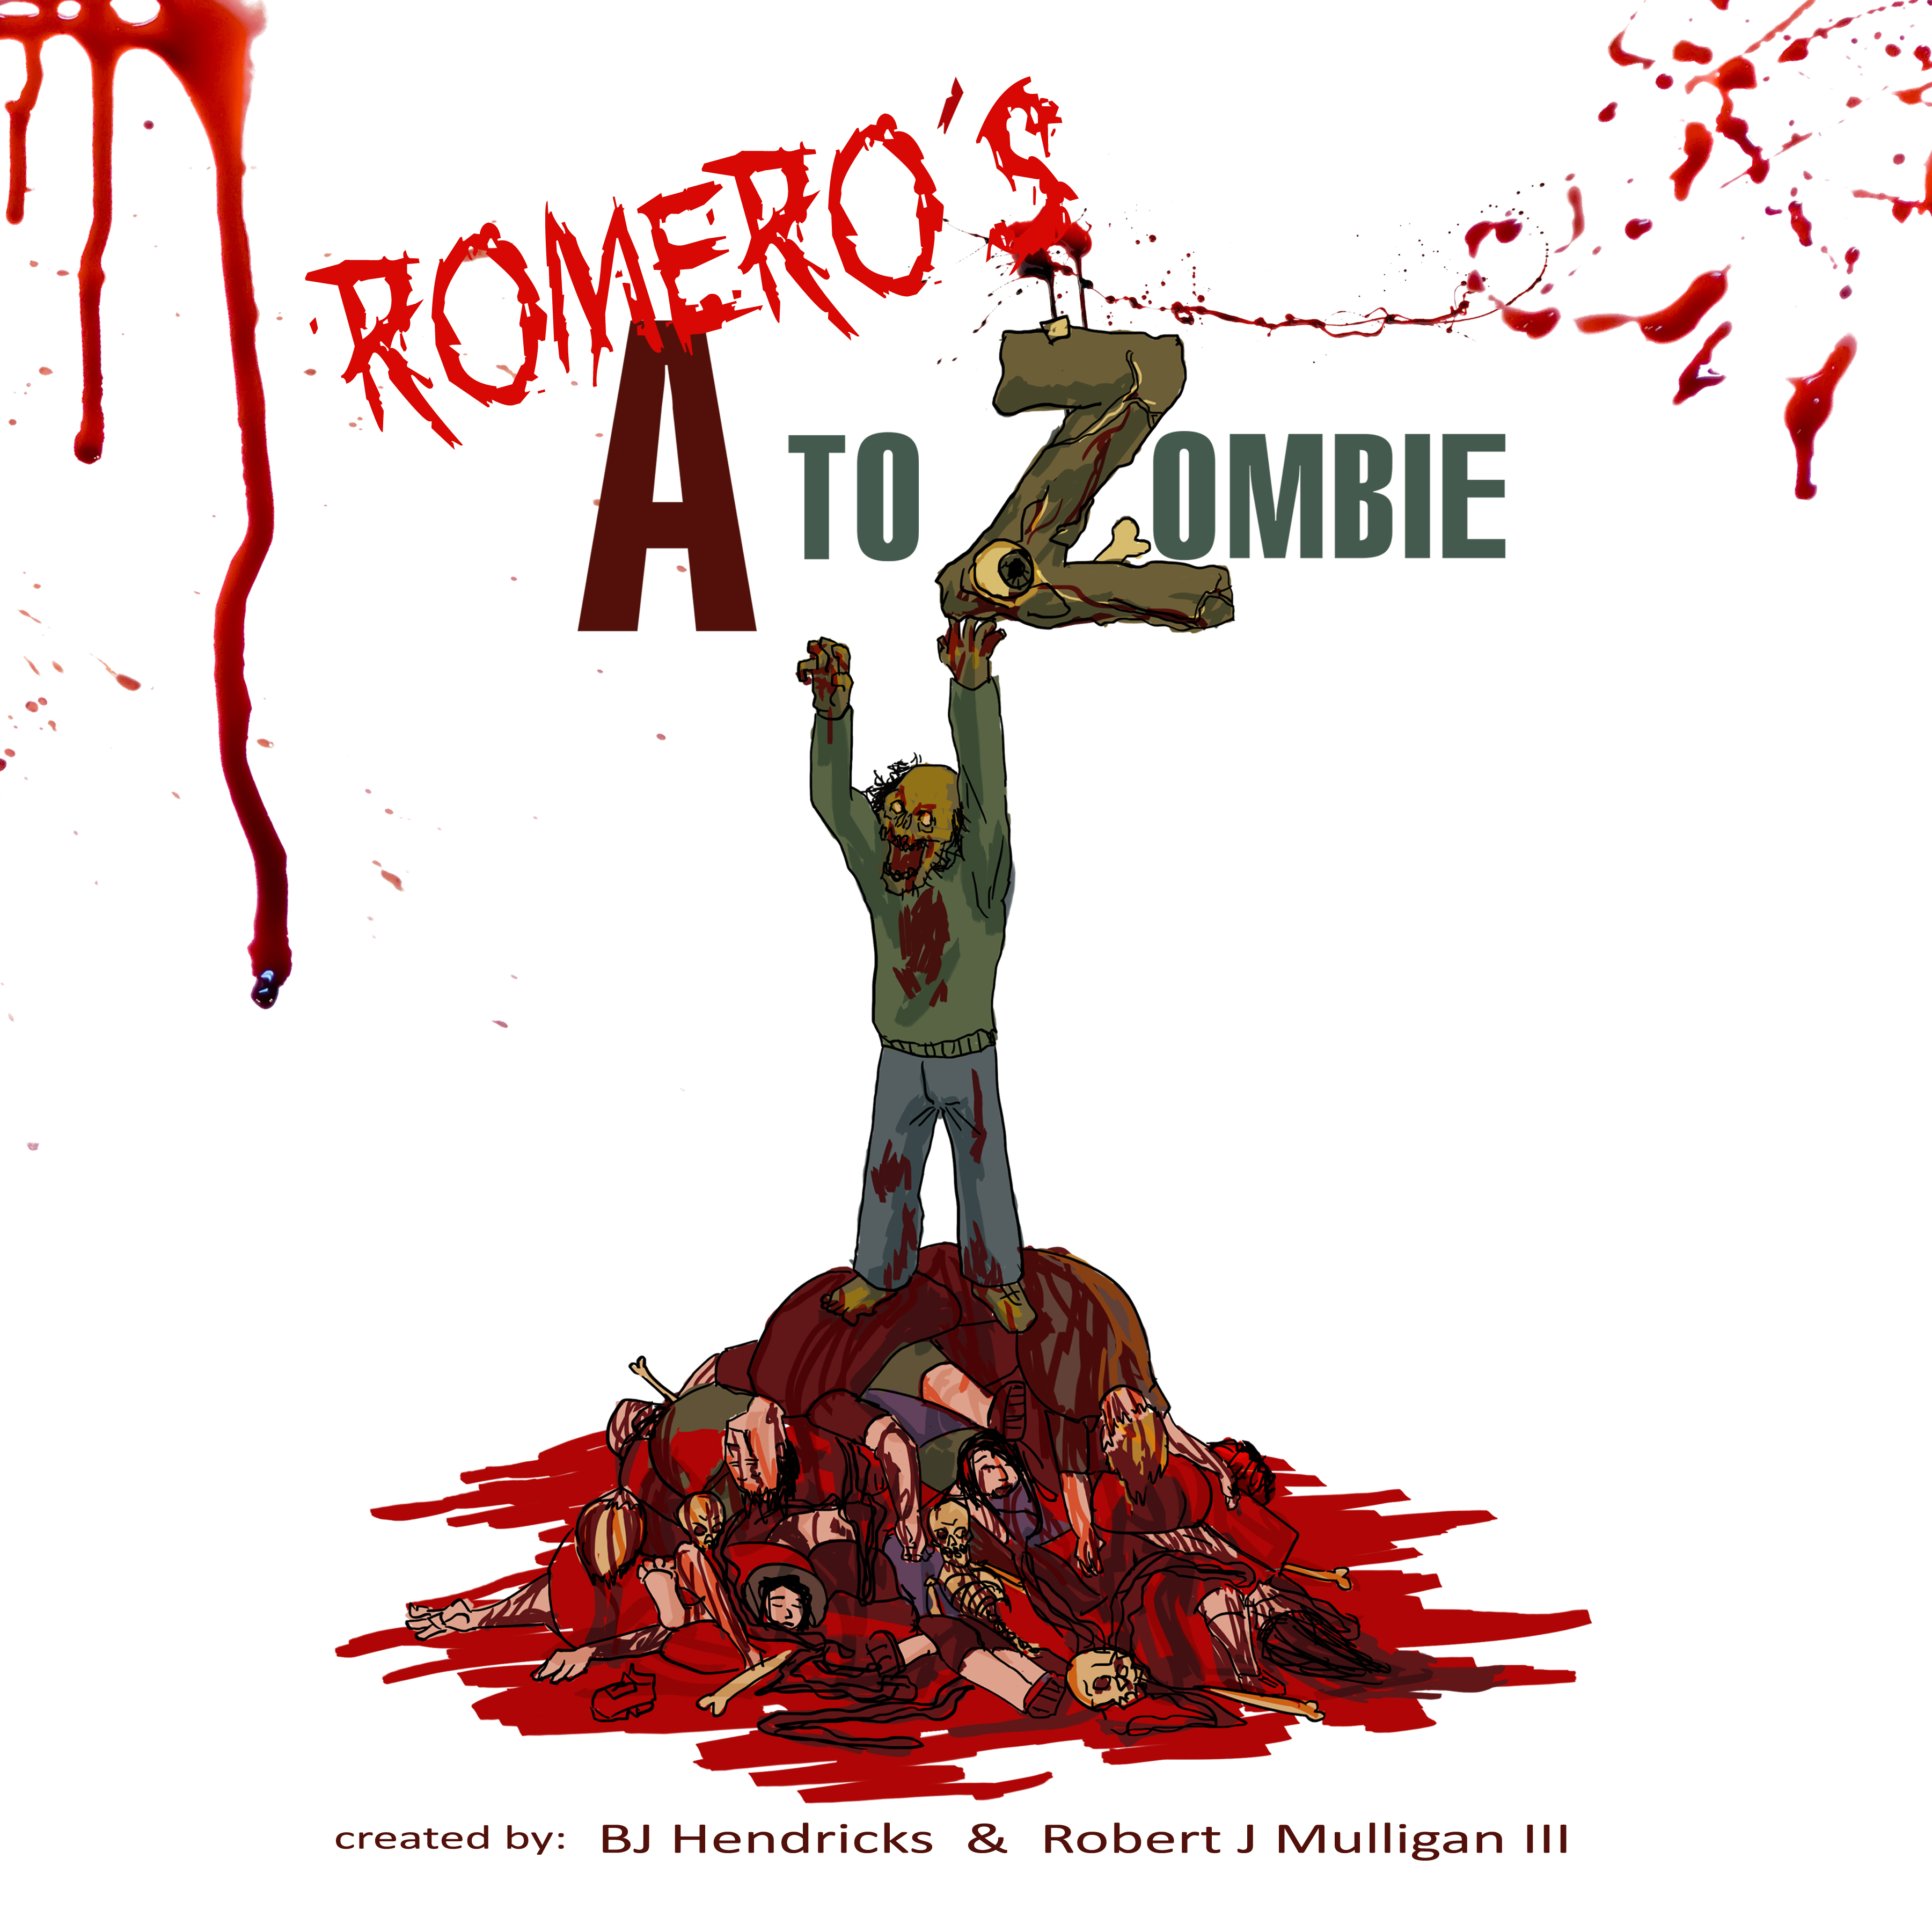 ROMERO'S A TO ZOMBIE